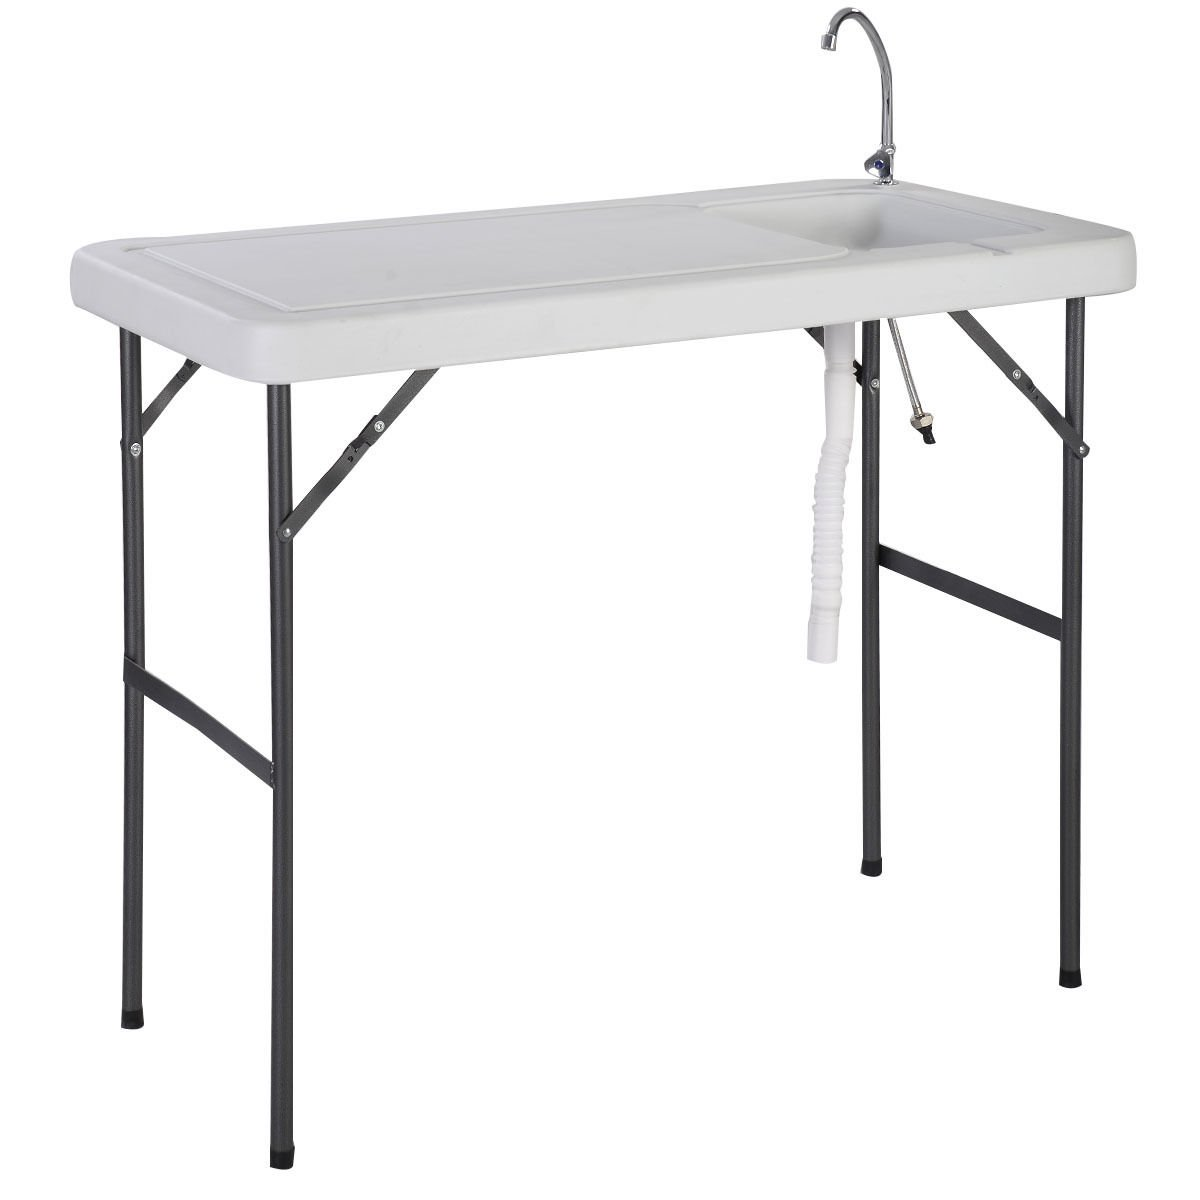 GHP 45''x23.6''x37.4'' 200Lbs Capacity Polyethylene Tabletop Folding Fish Cleaning Table